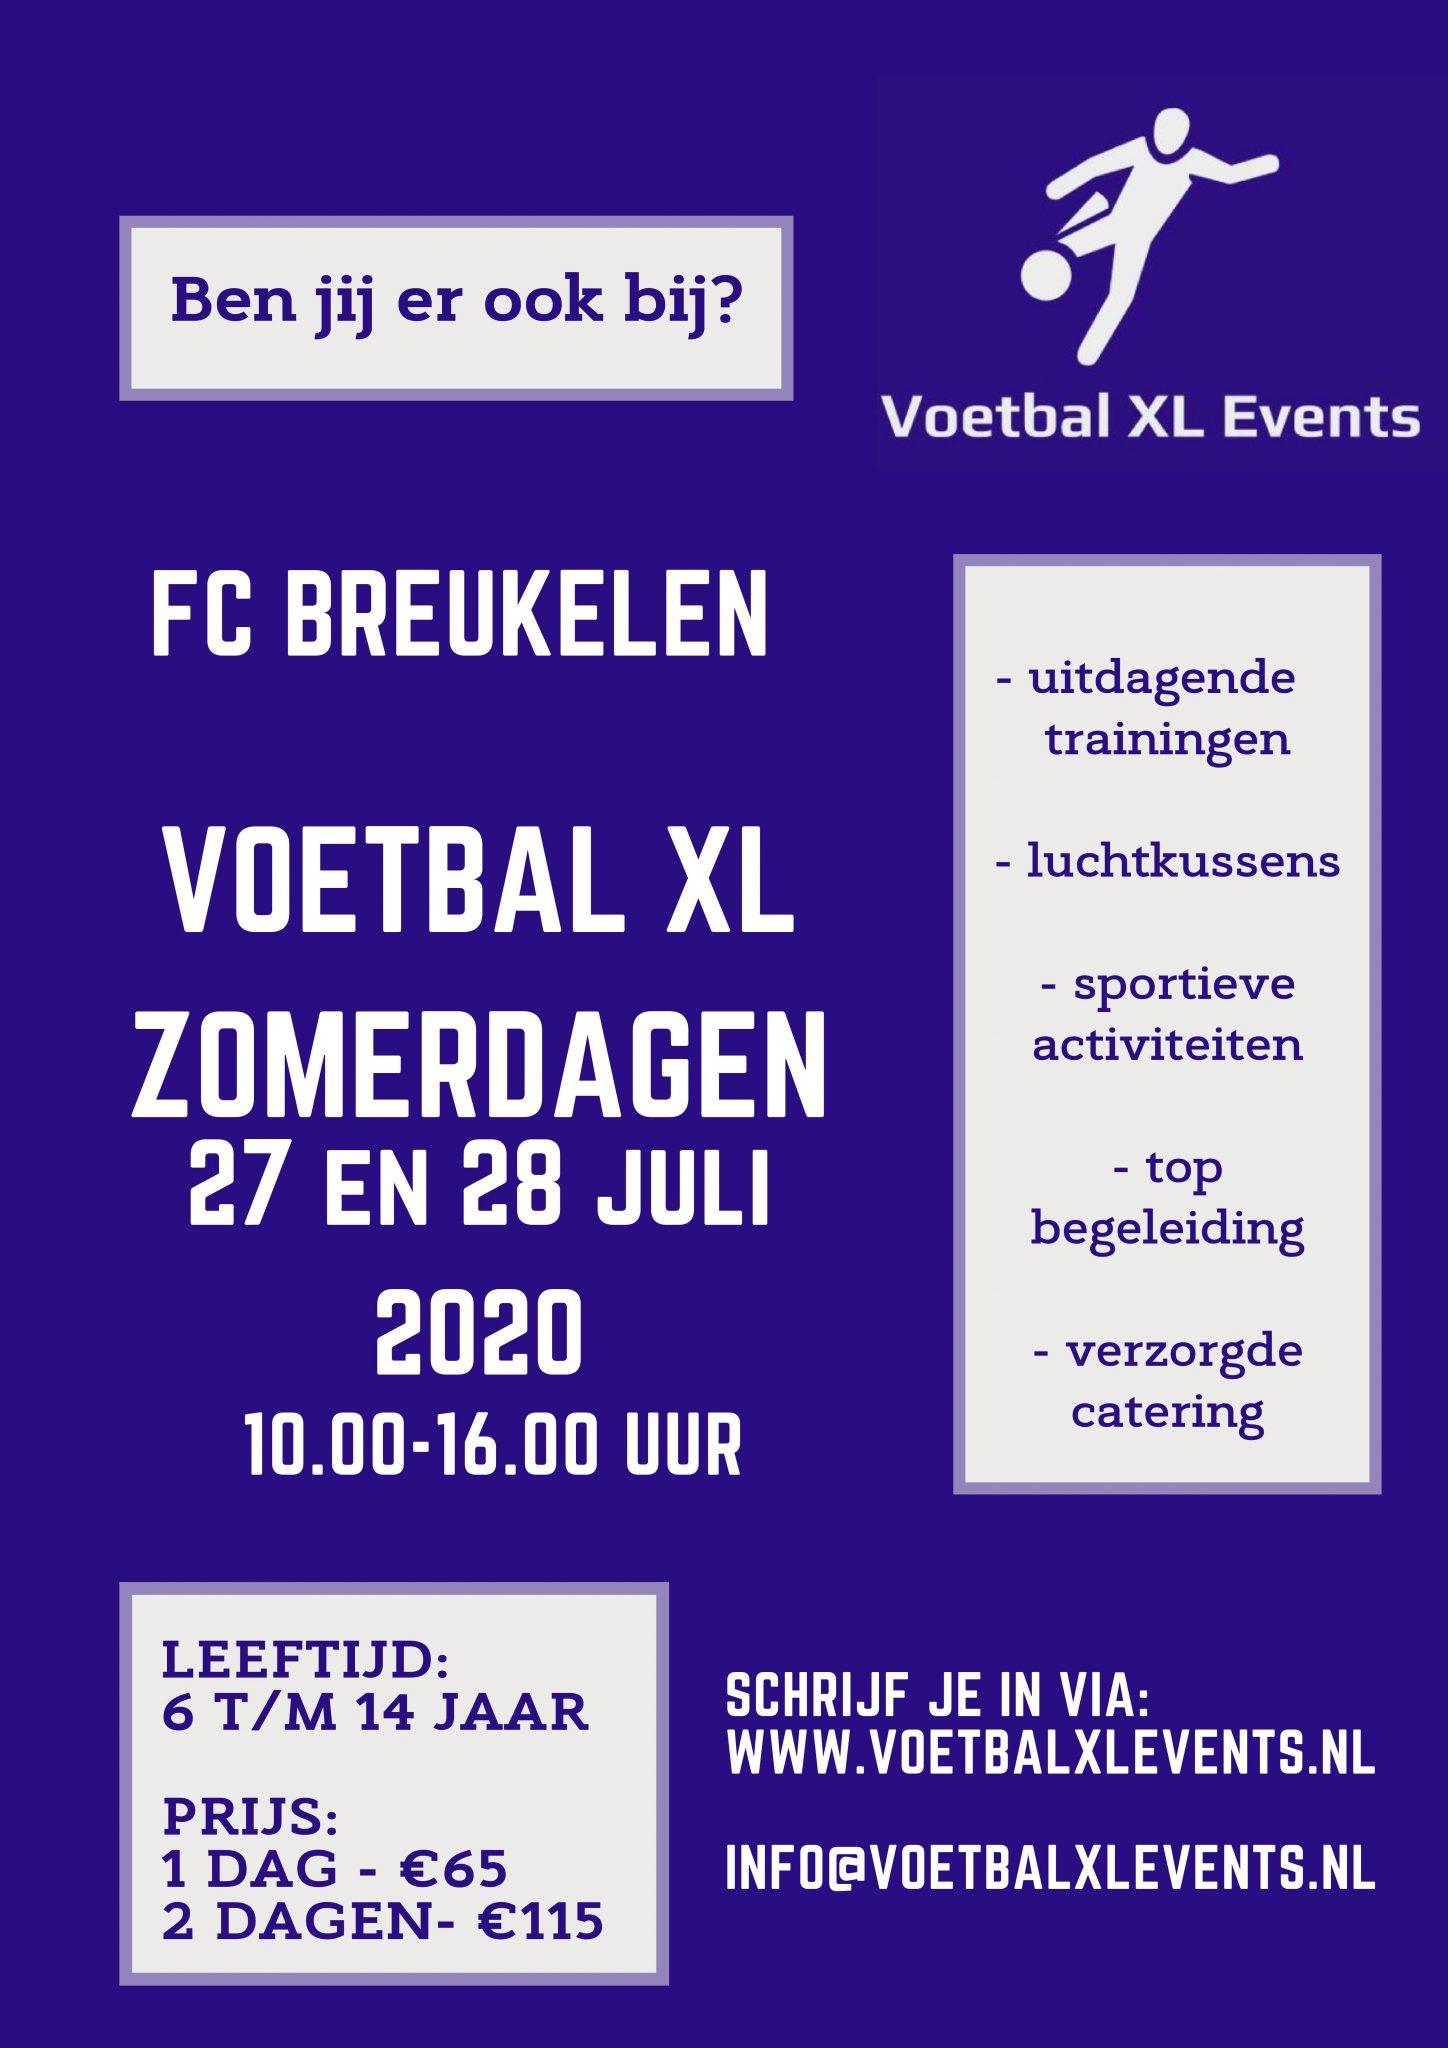 Voetbal XL Zomerdagen bij FC Breukelen! 27 en 28 juli